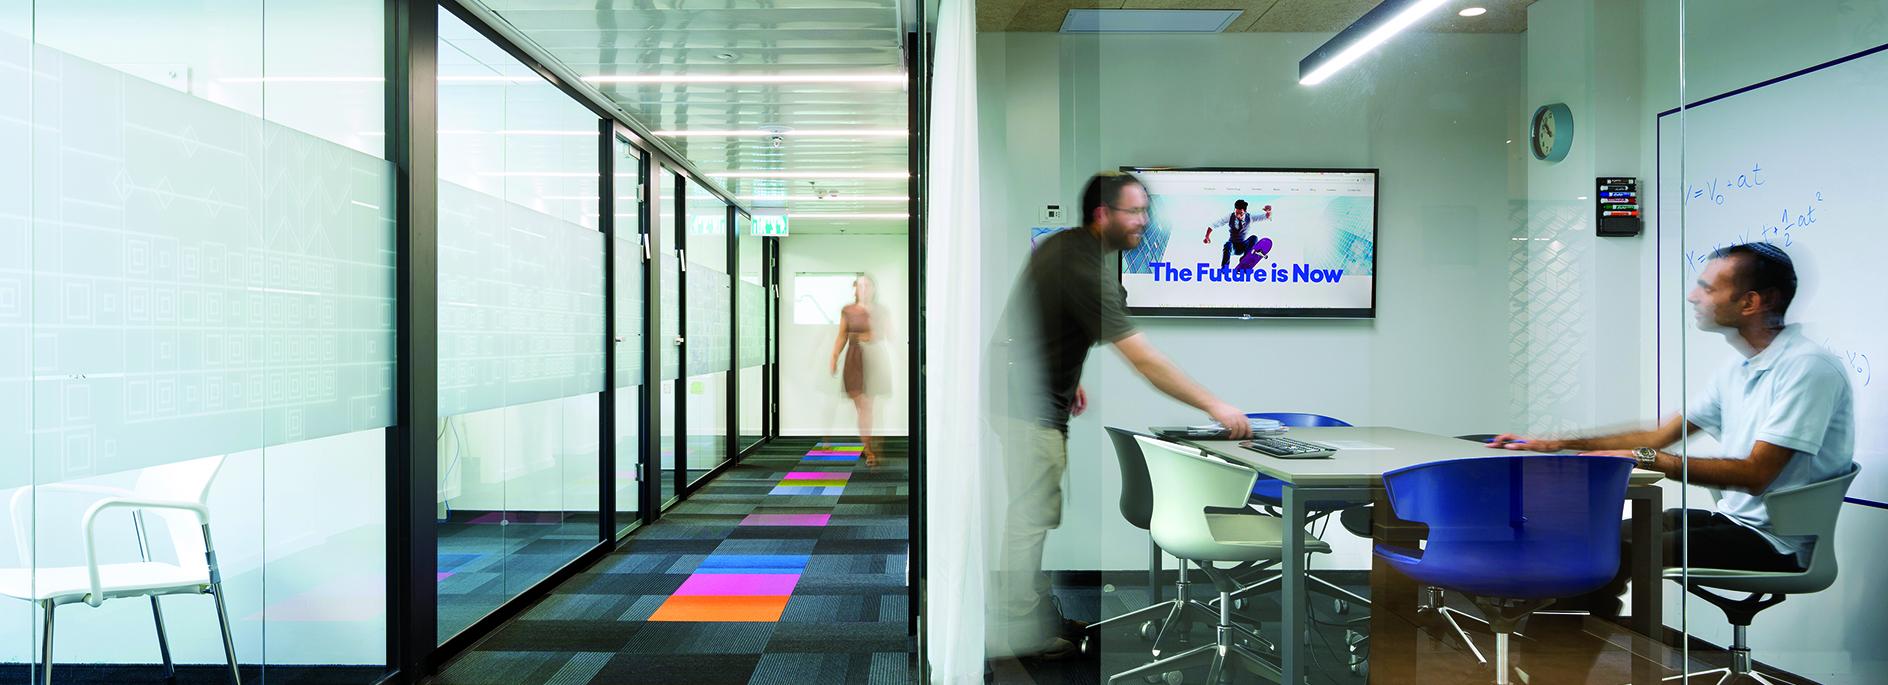 Big Image Meeting Room Design 3